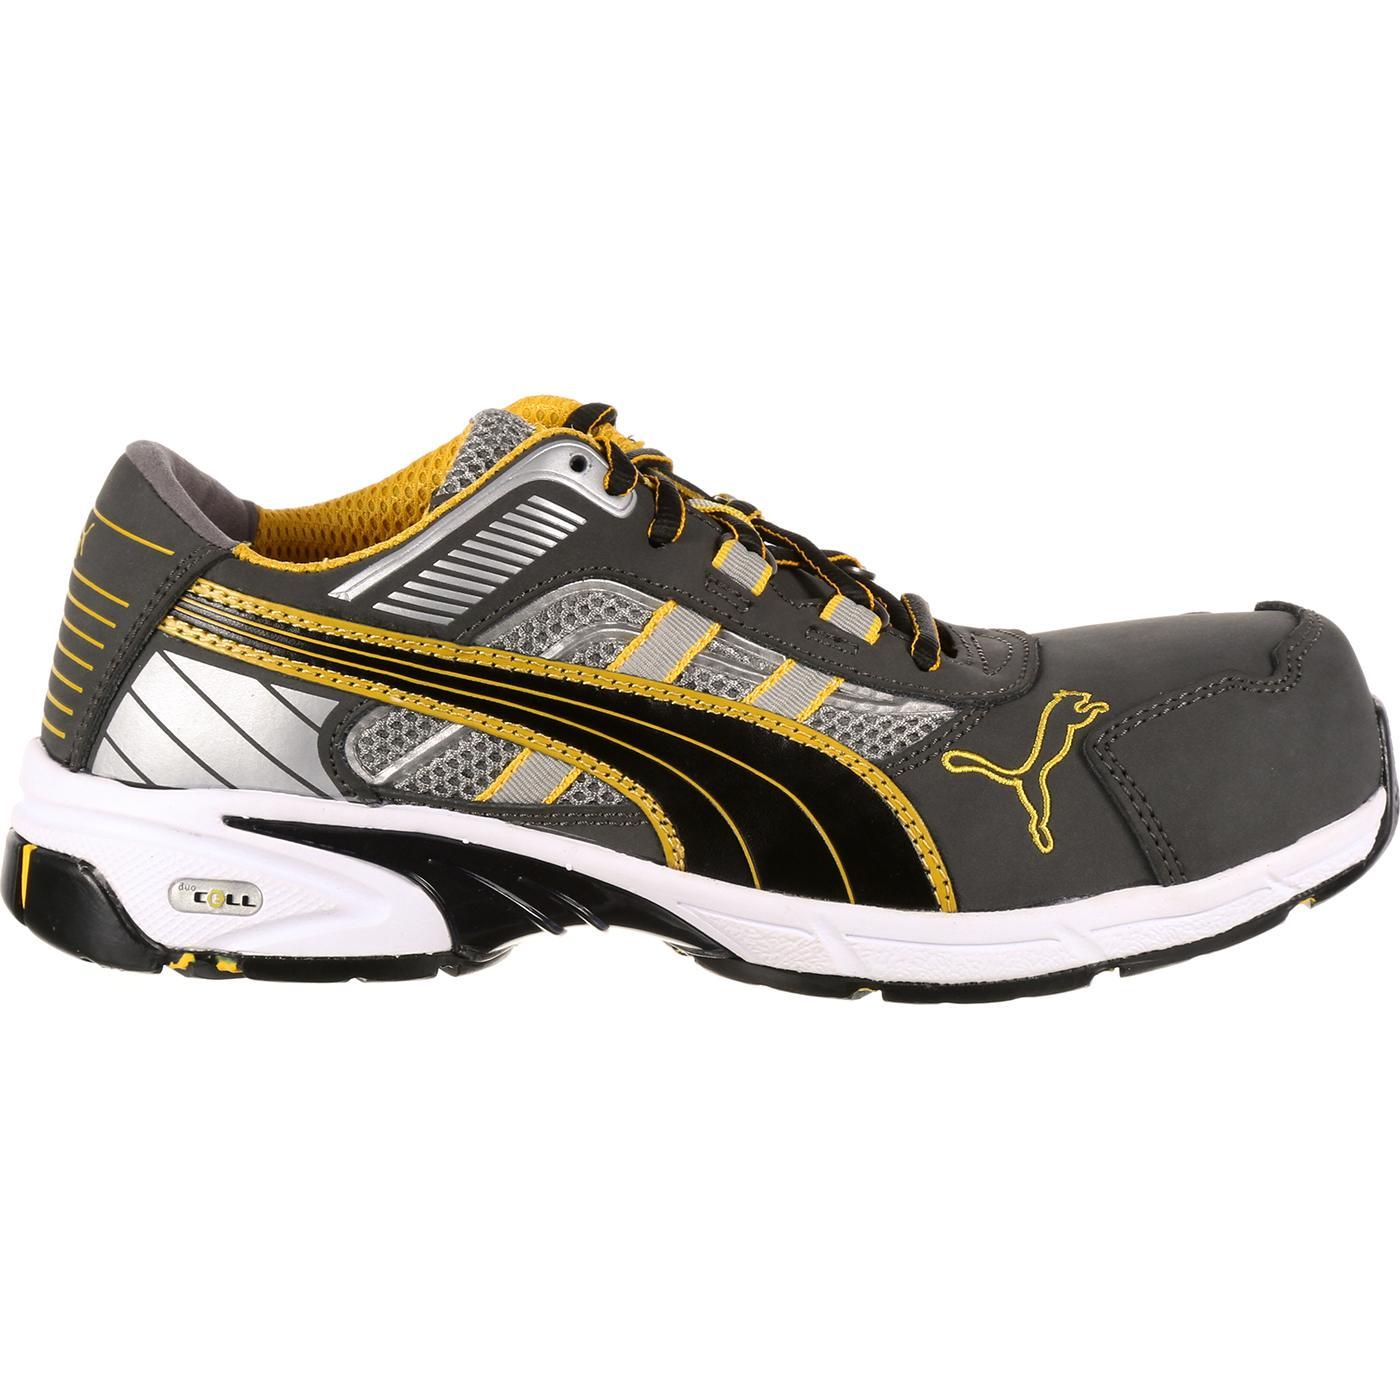 Puma Running Style Composite Toe SD Work Shoe, #P642565